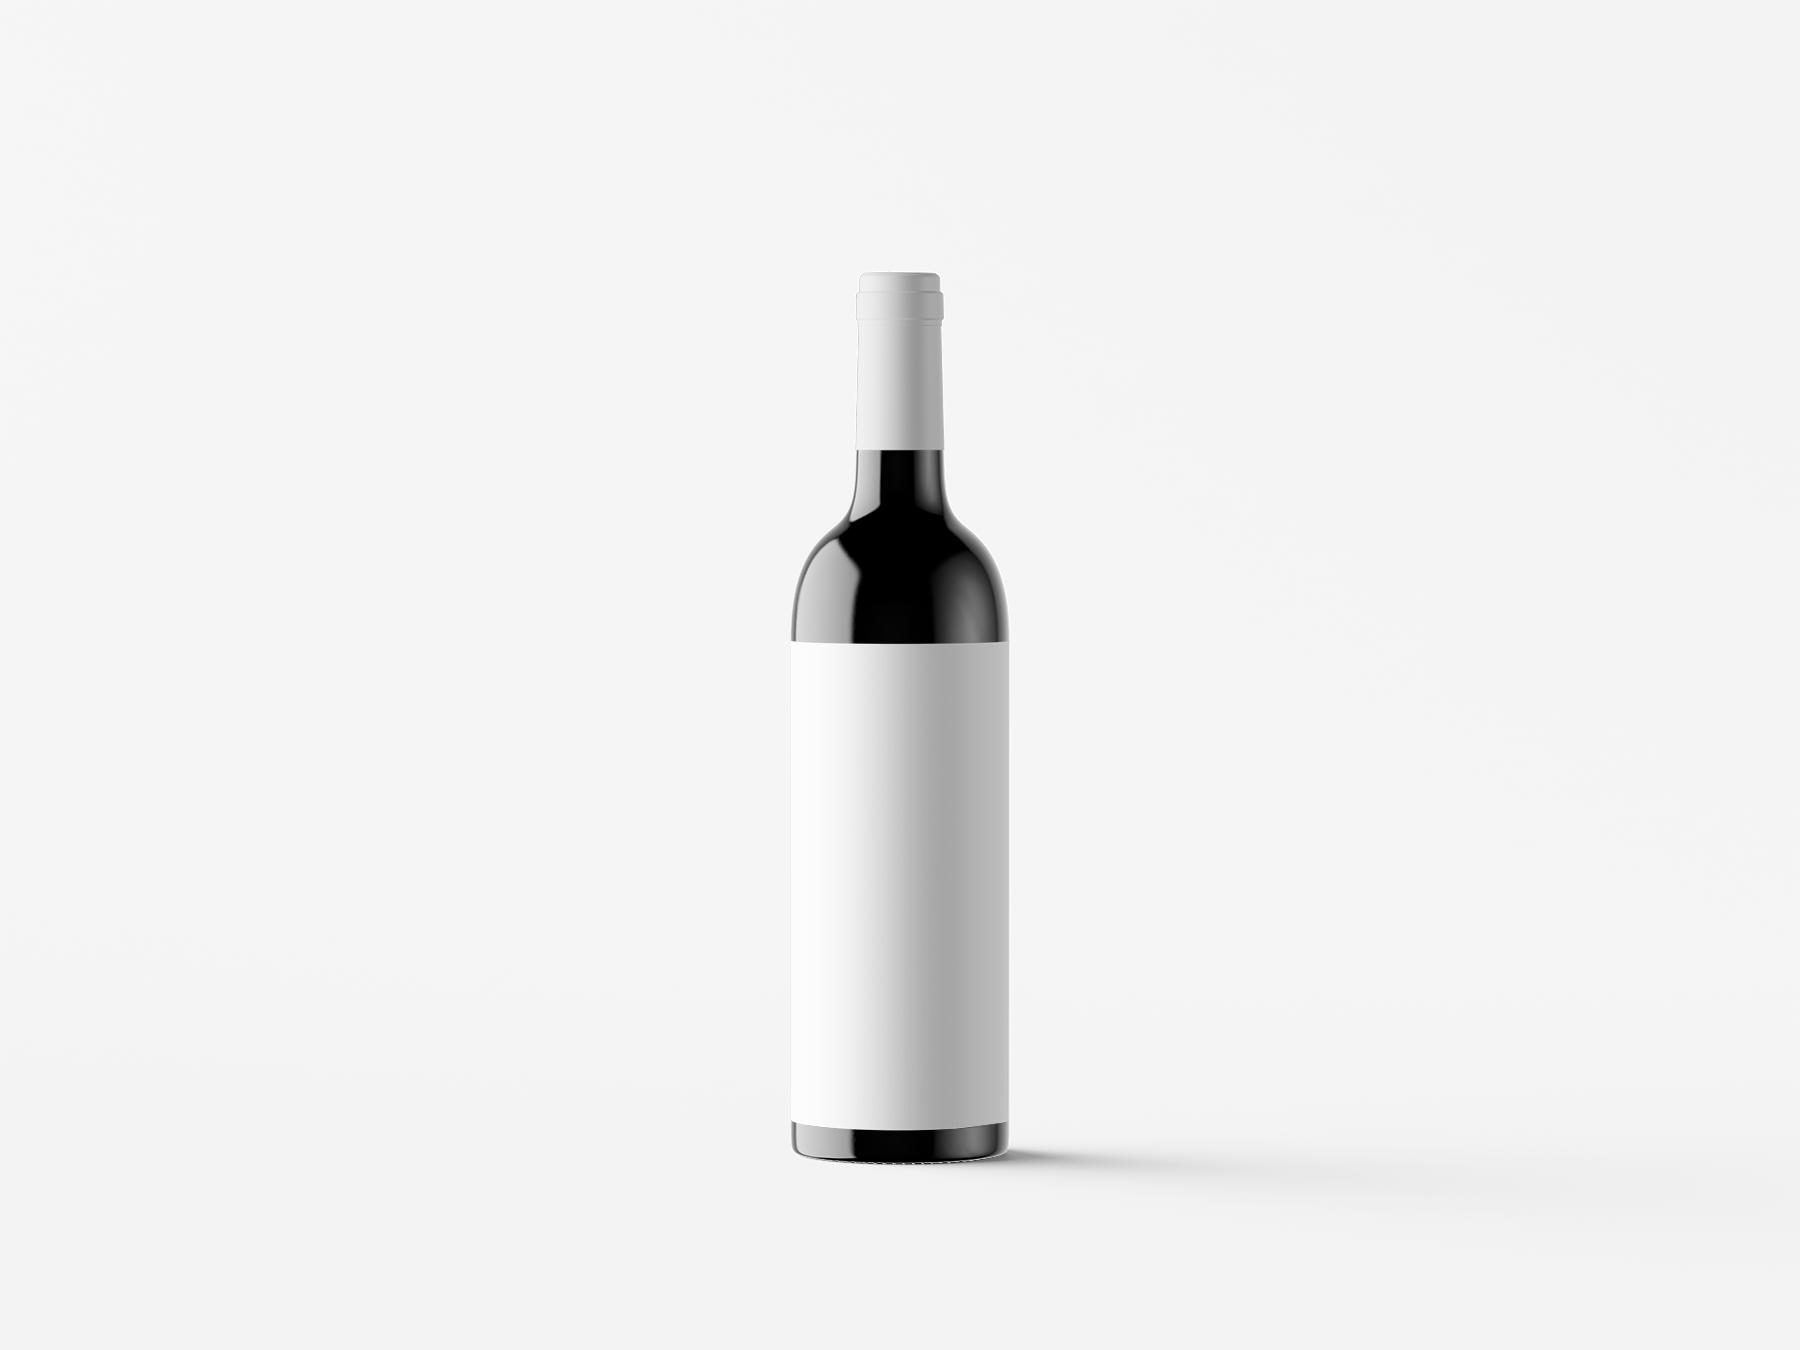 Free Standing Wine Bottle Mockup